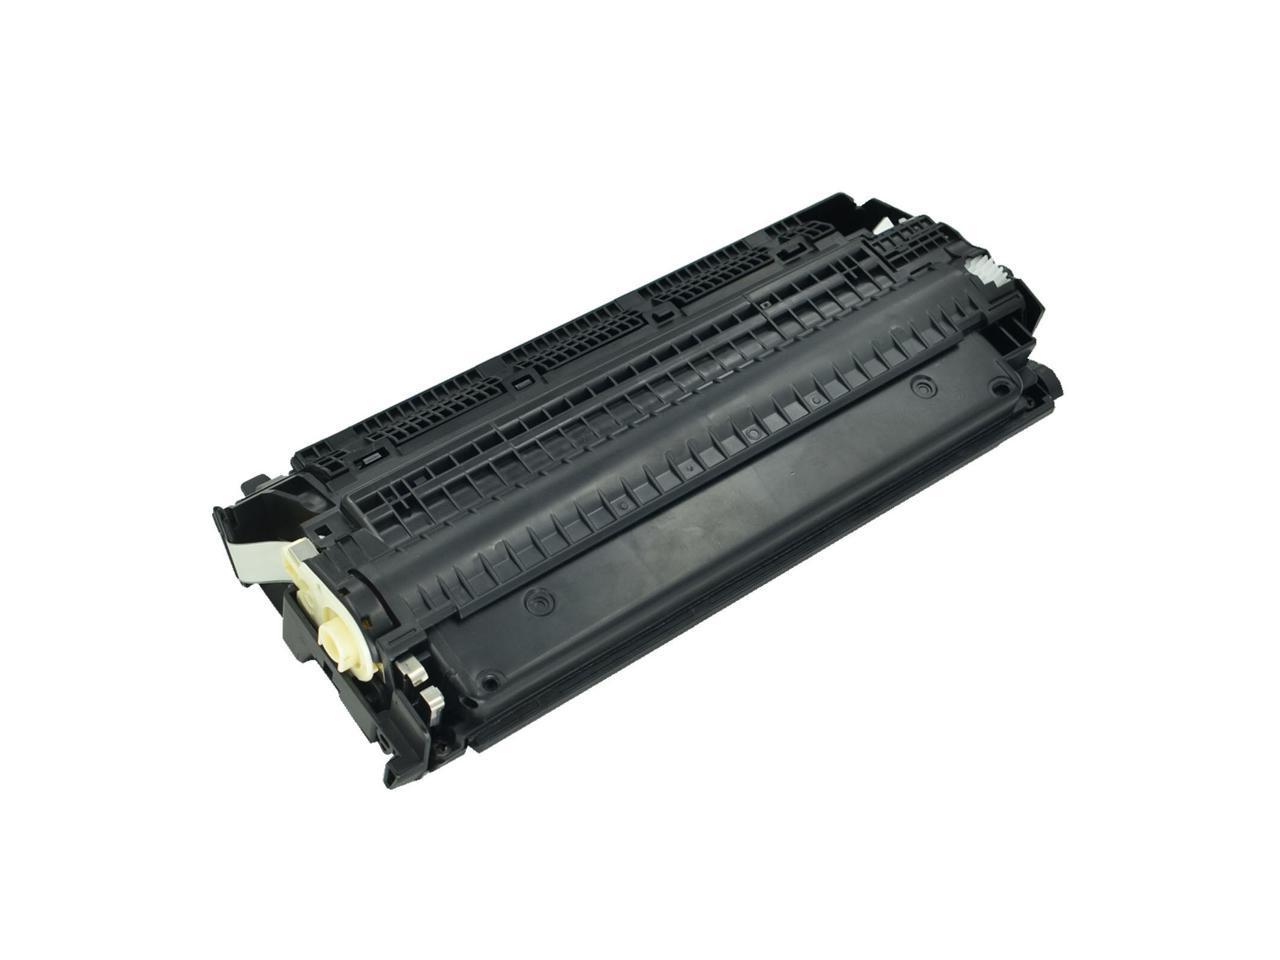 3PACK E40 Replacement Black Toner Cartridge For Canon FC-200 PC920 FC-220 PC210 - Newegg.com